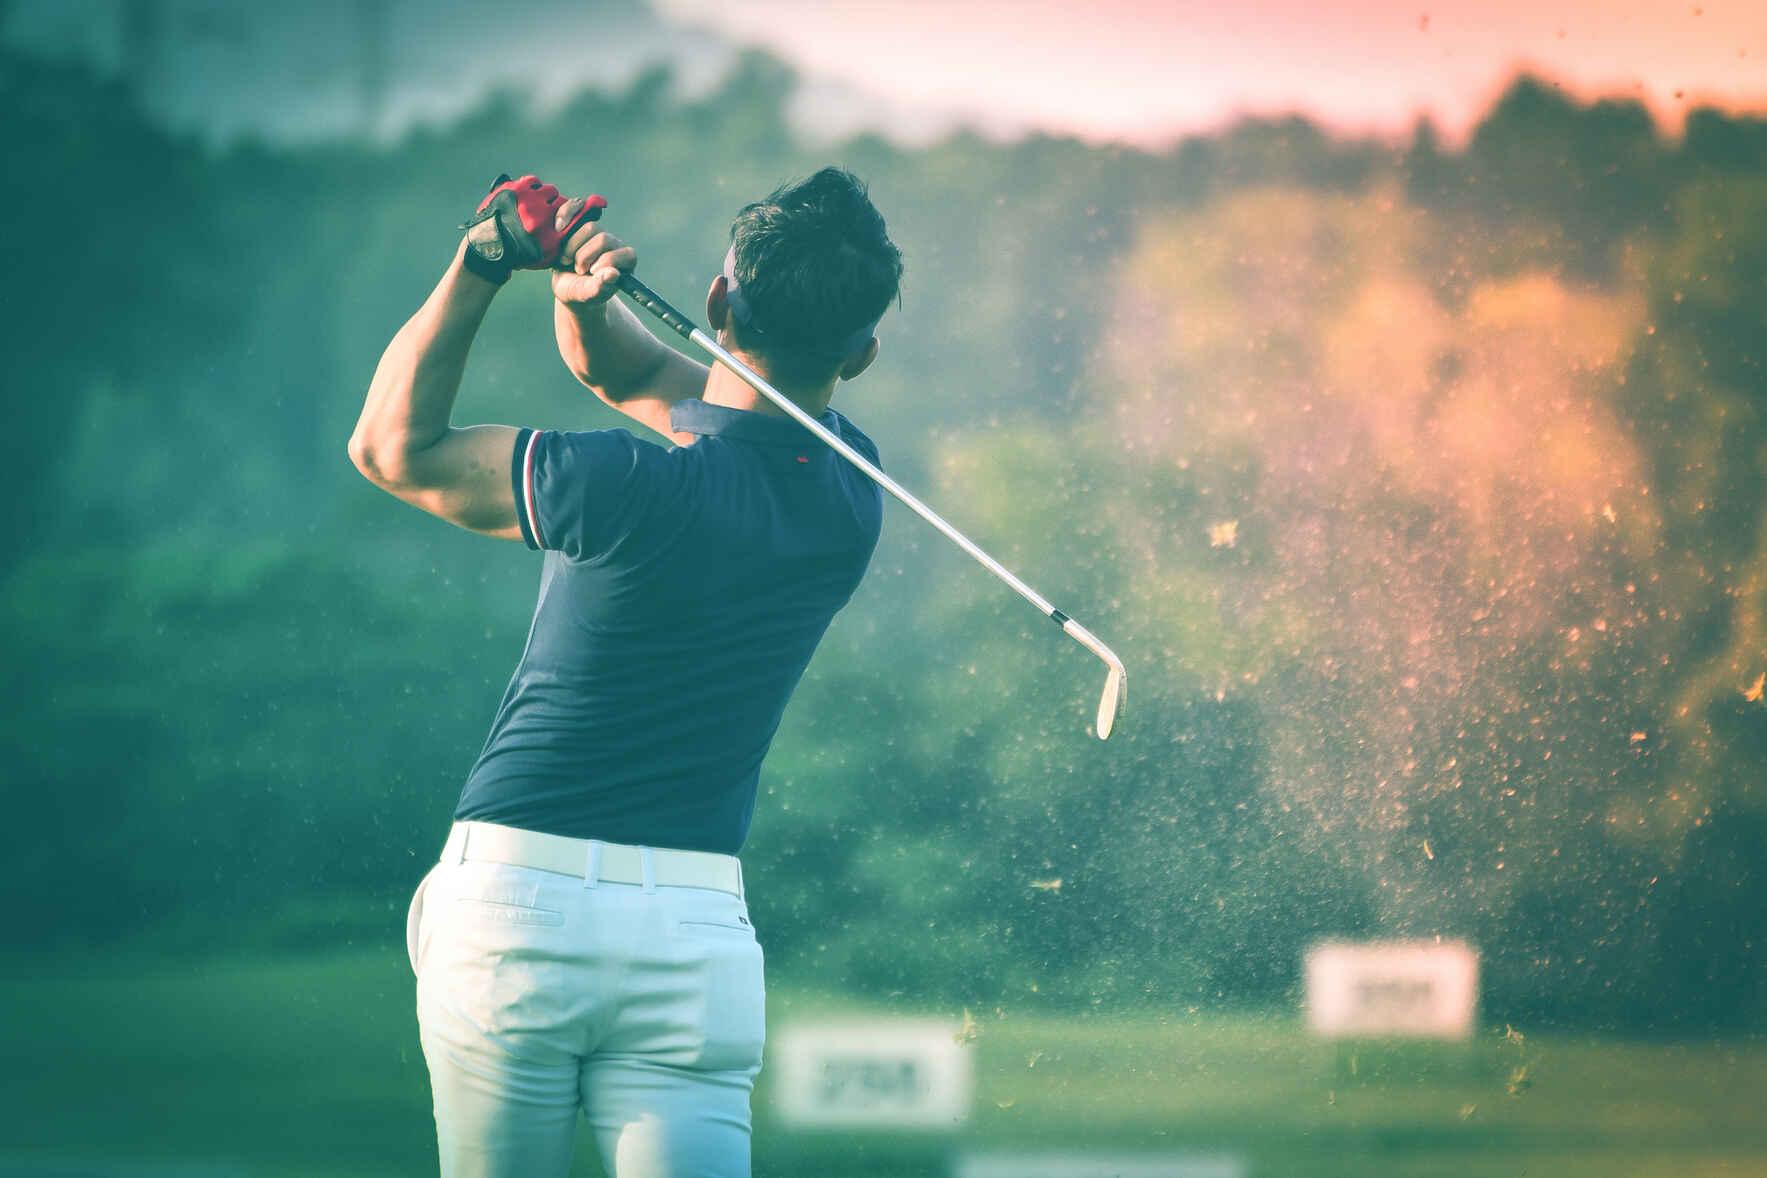 15th Annual Jack McGovern Coats' Disease Golf Tournament image